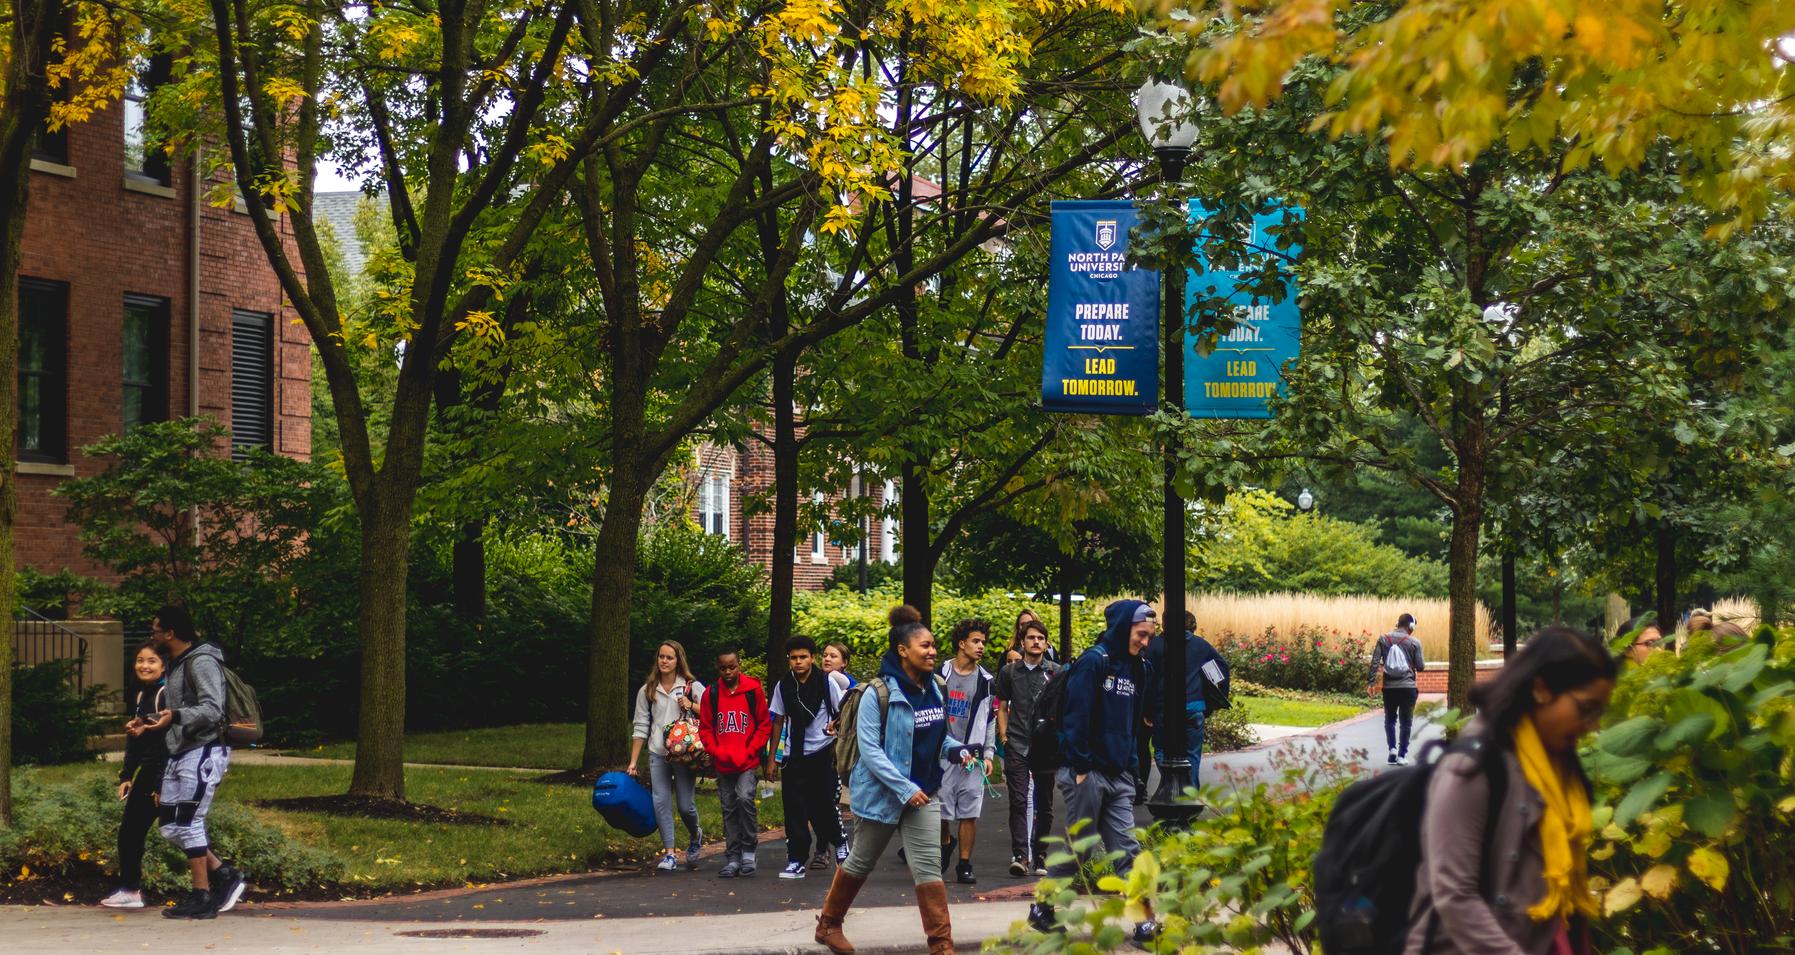 Undergraduate Admissions featured image background